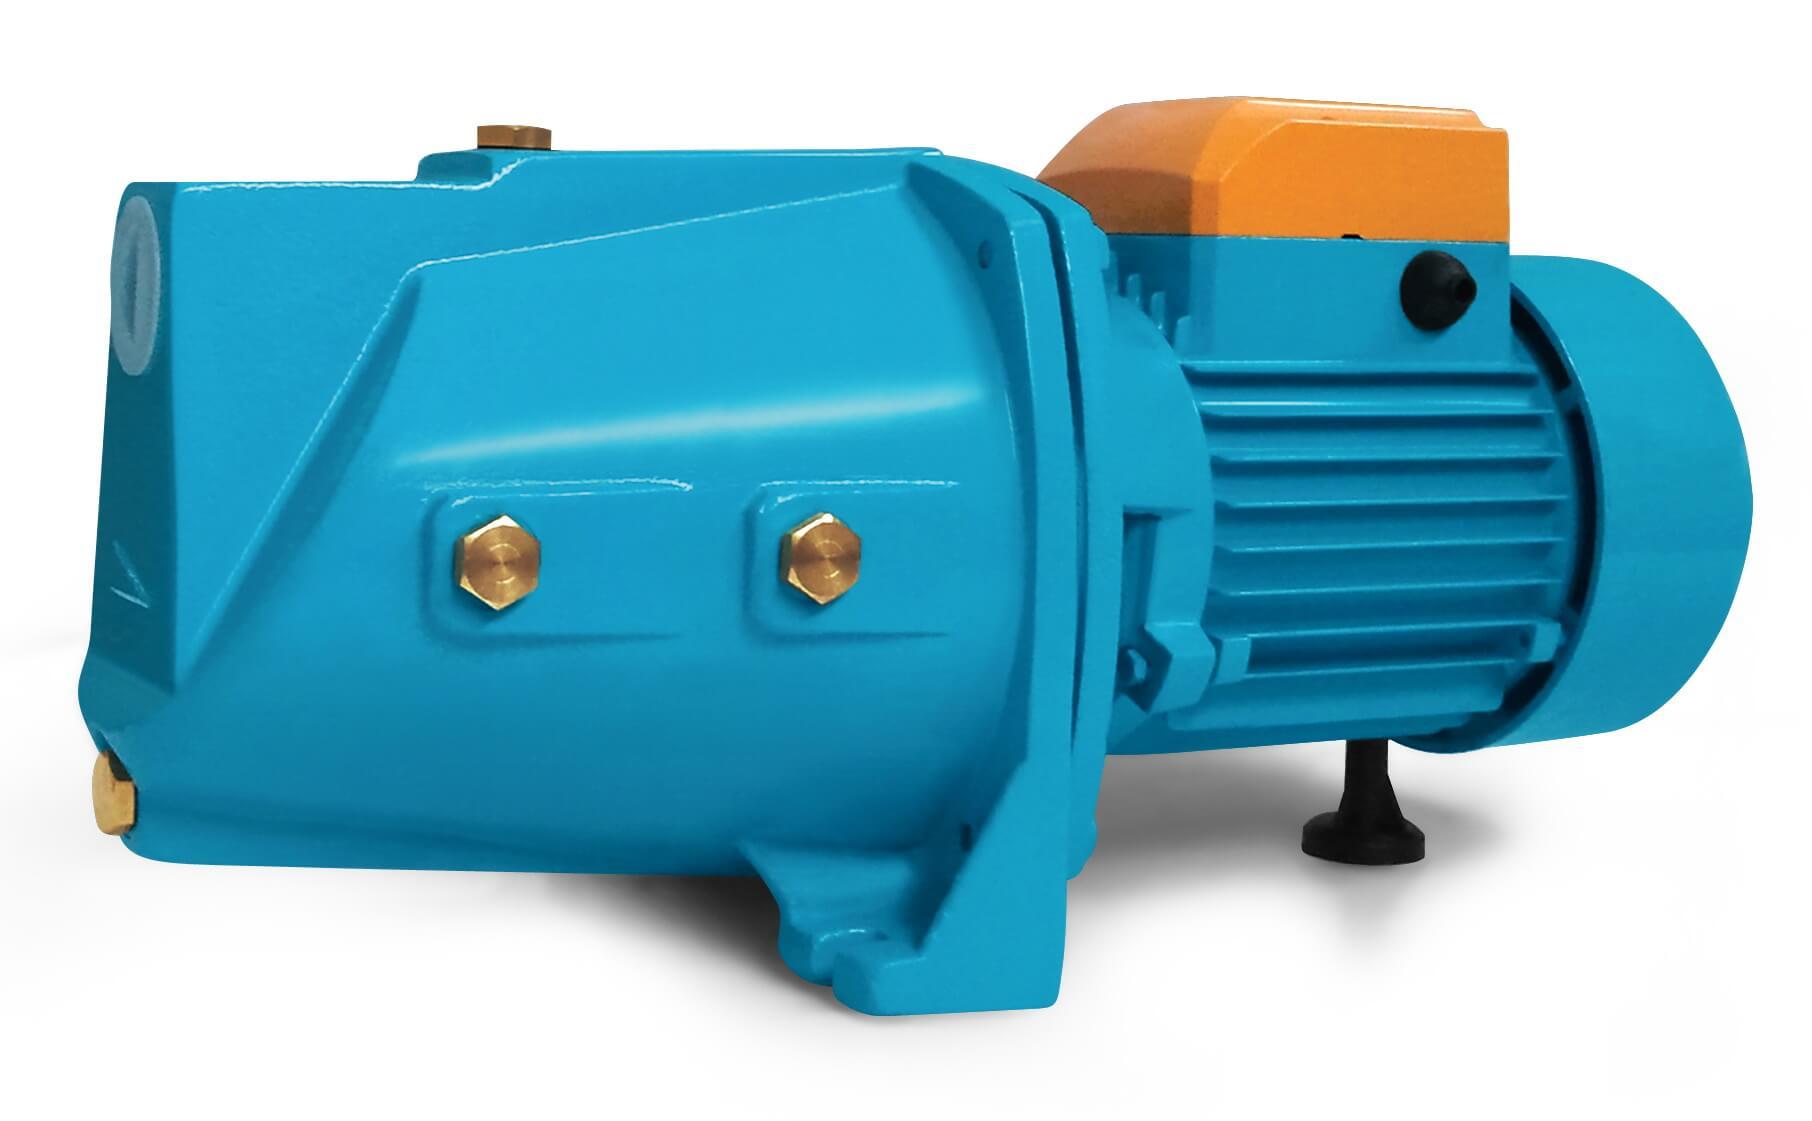 Eurom TP1100S Professionele tuinpomp 1100W | Centrifugaalpomp | Zelfaanzuigende grondwaterpomp